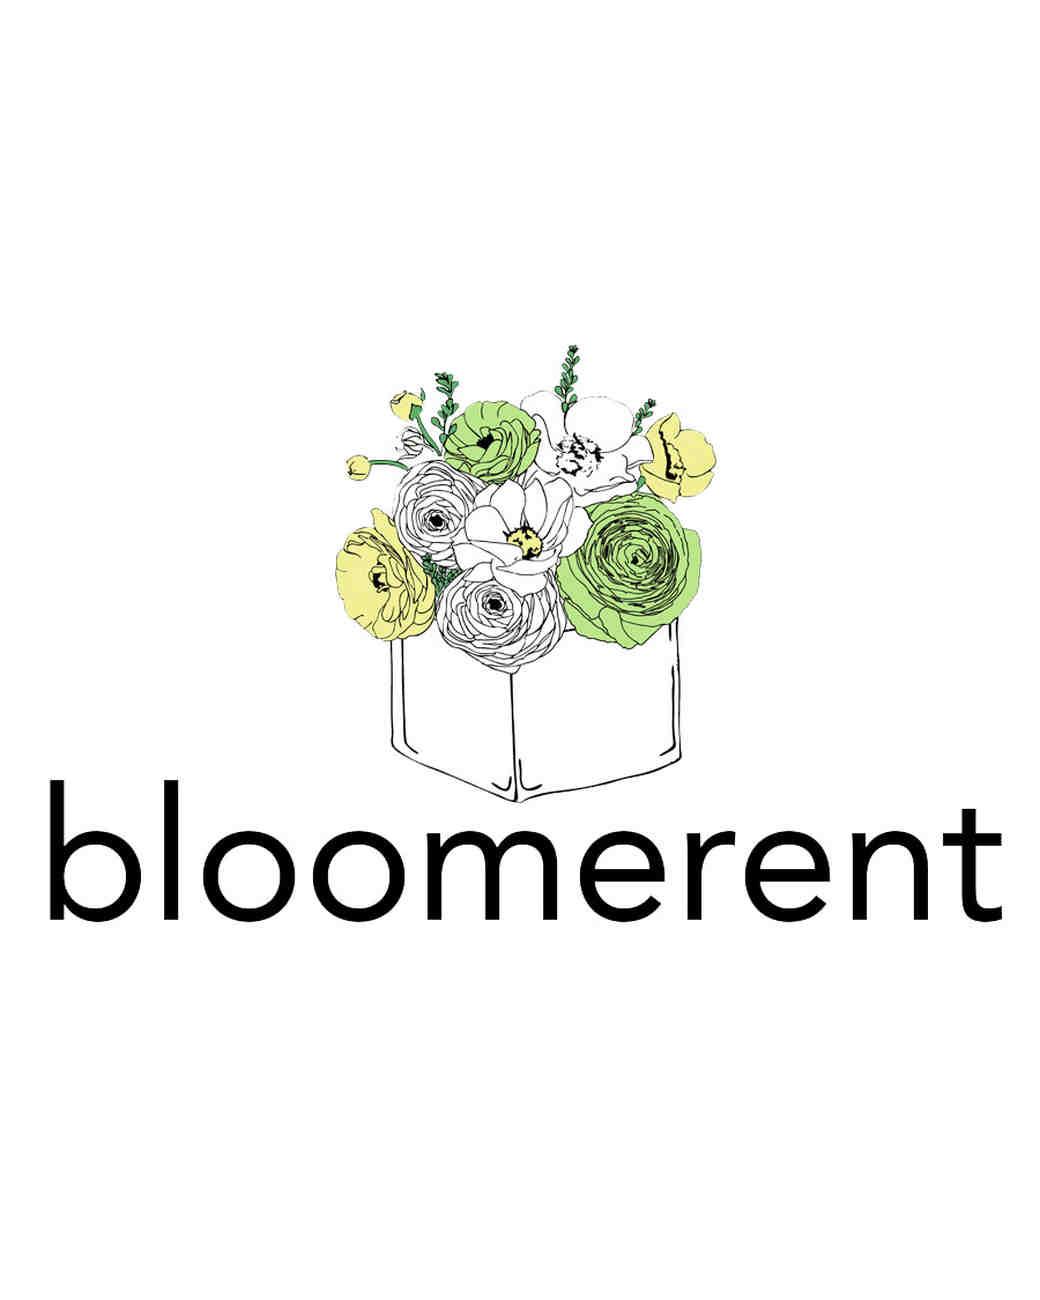 bloomerent logo